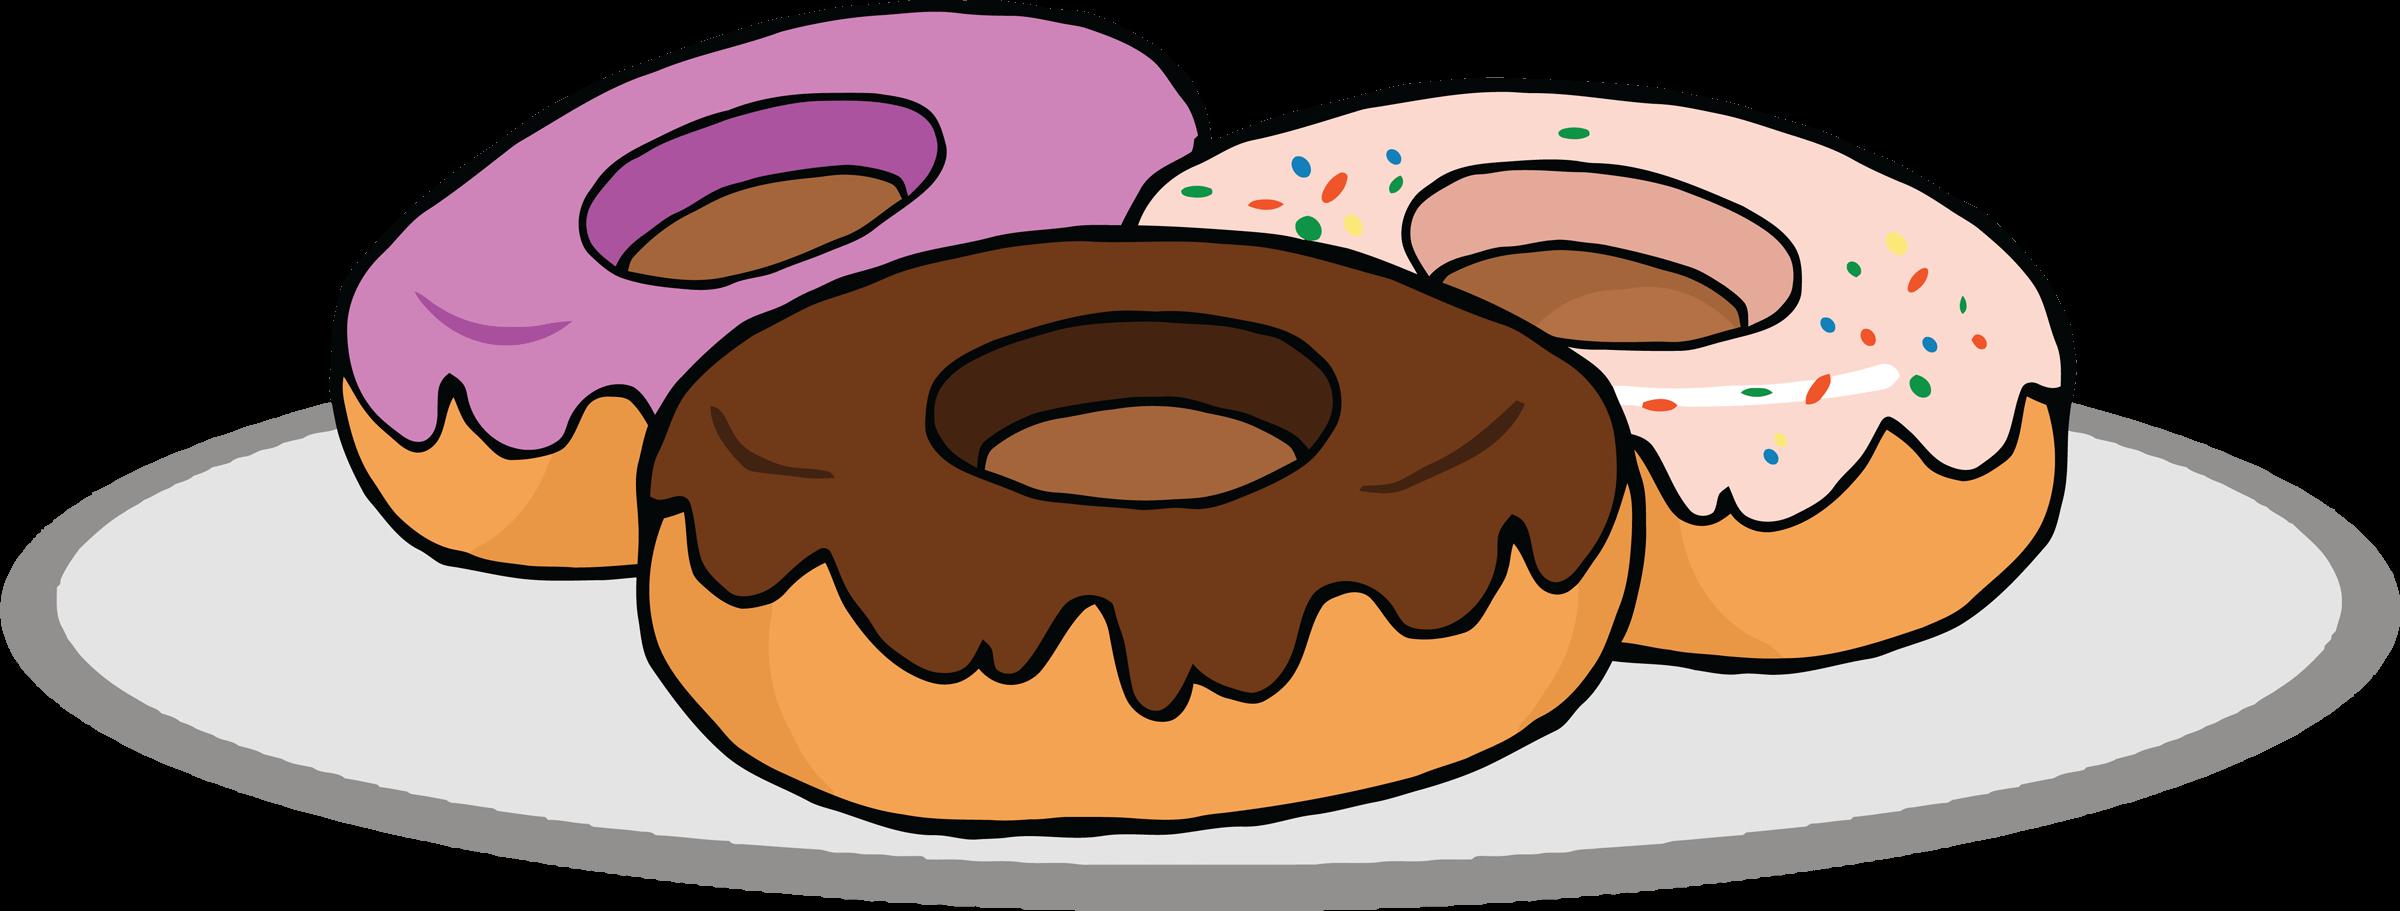 Free donuts cliparts download. Donut clipart dozen